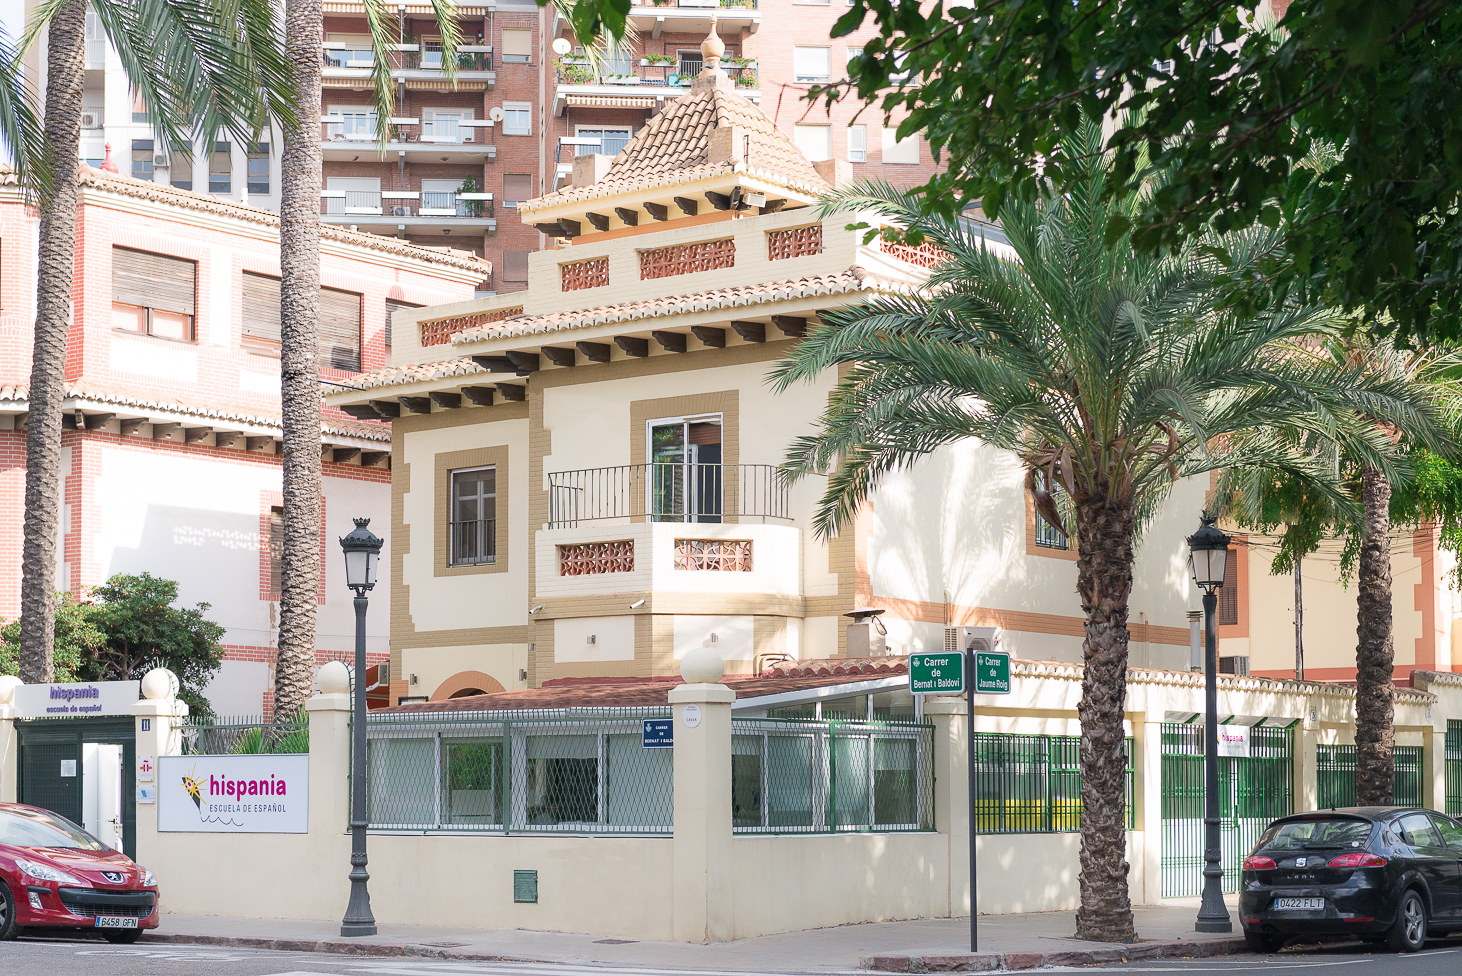 Hispania - edificio principal